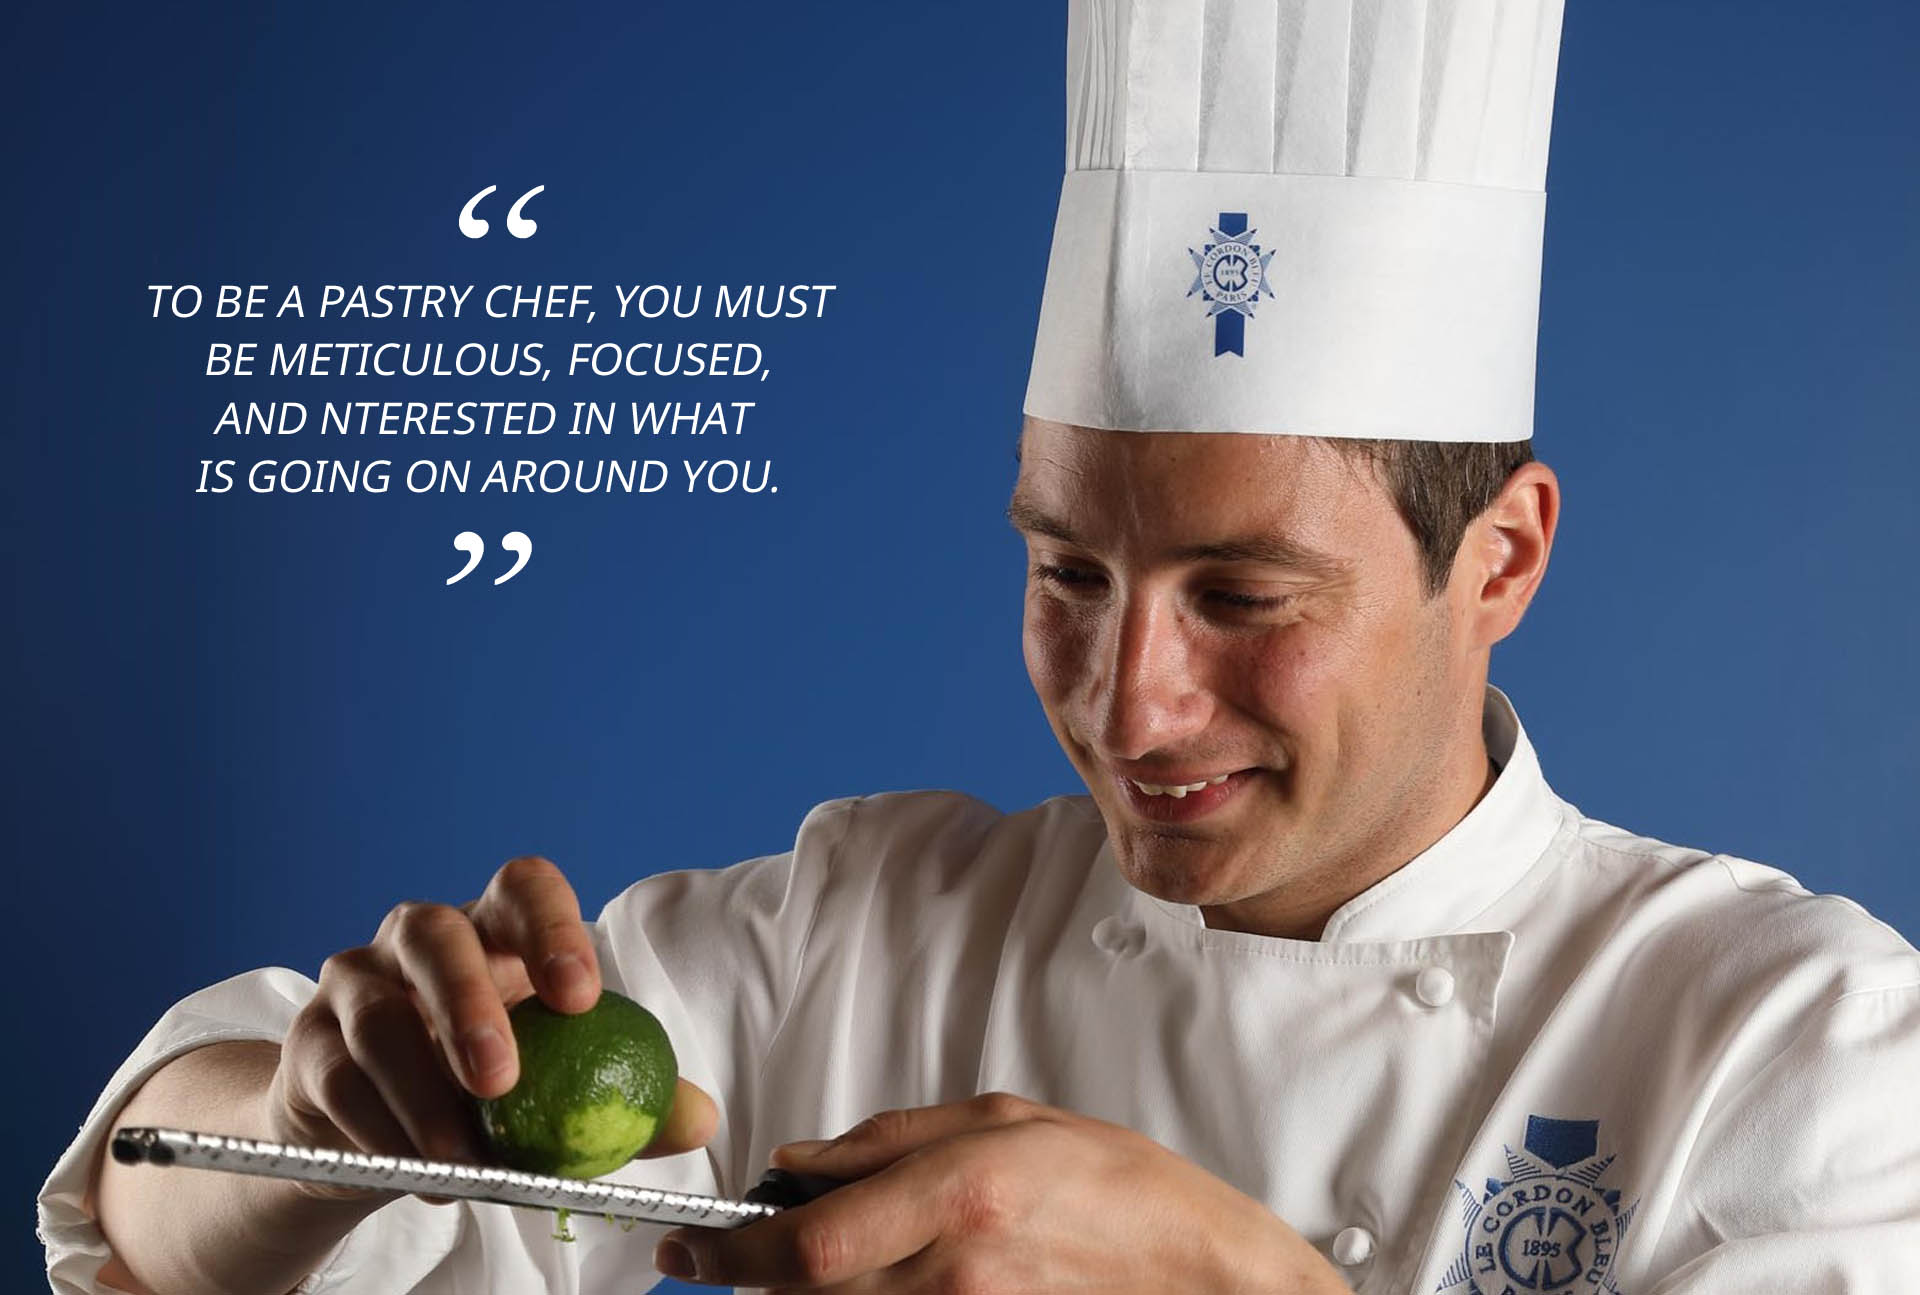 Pastry Chef Vincent Valton